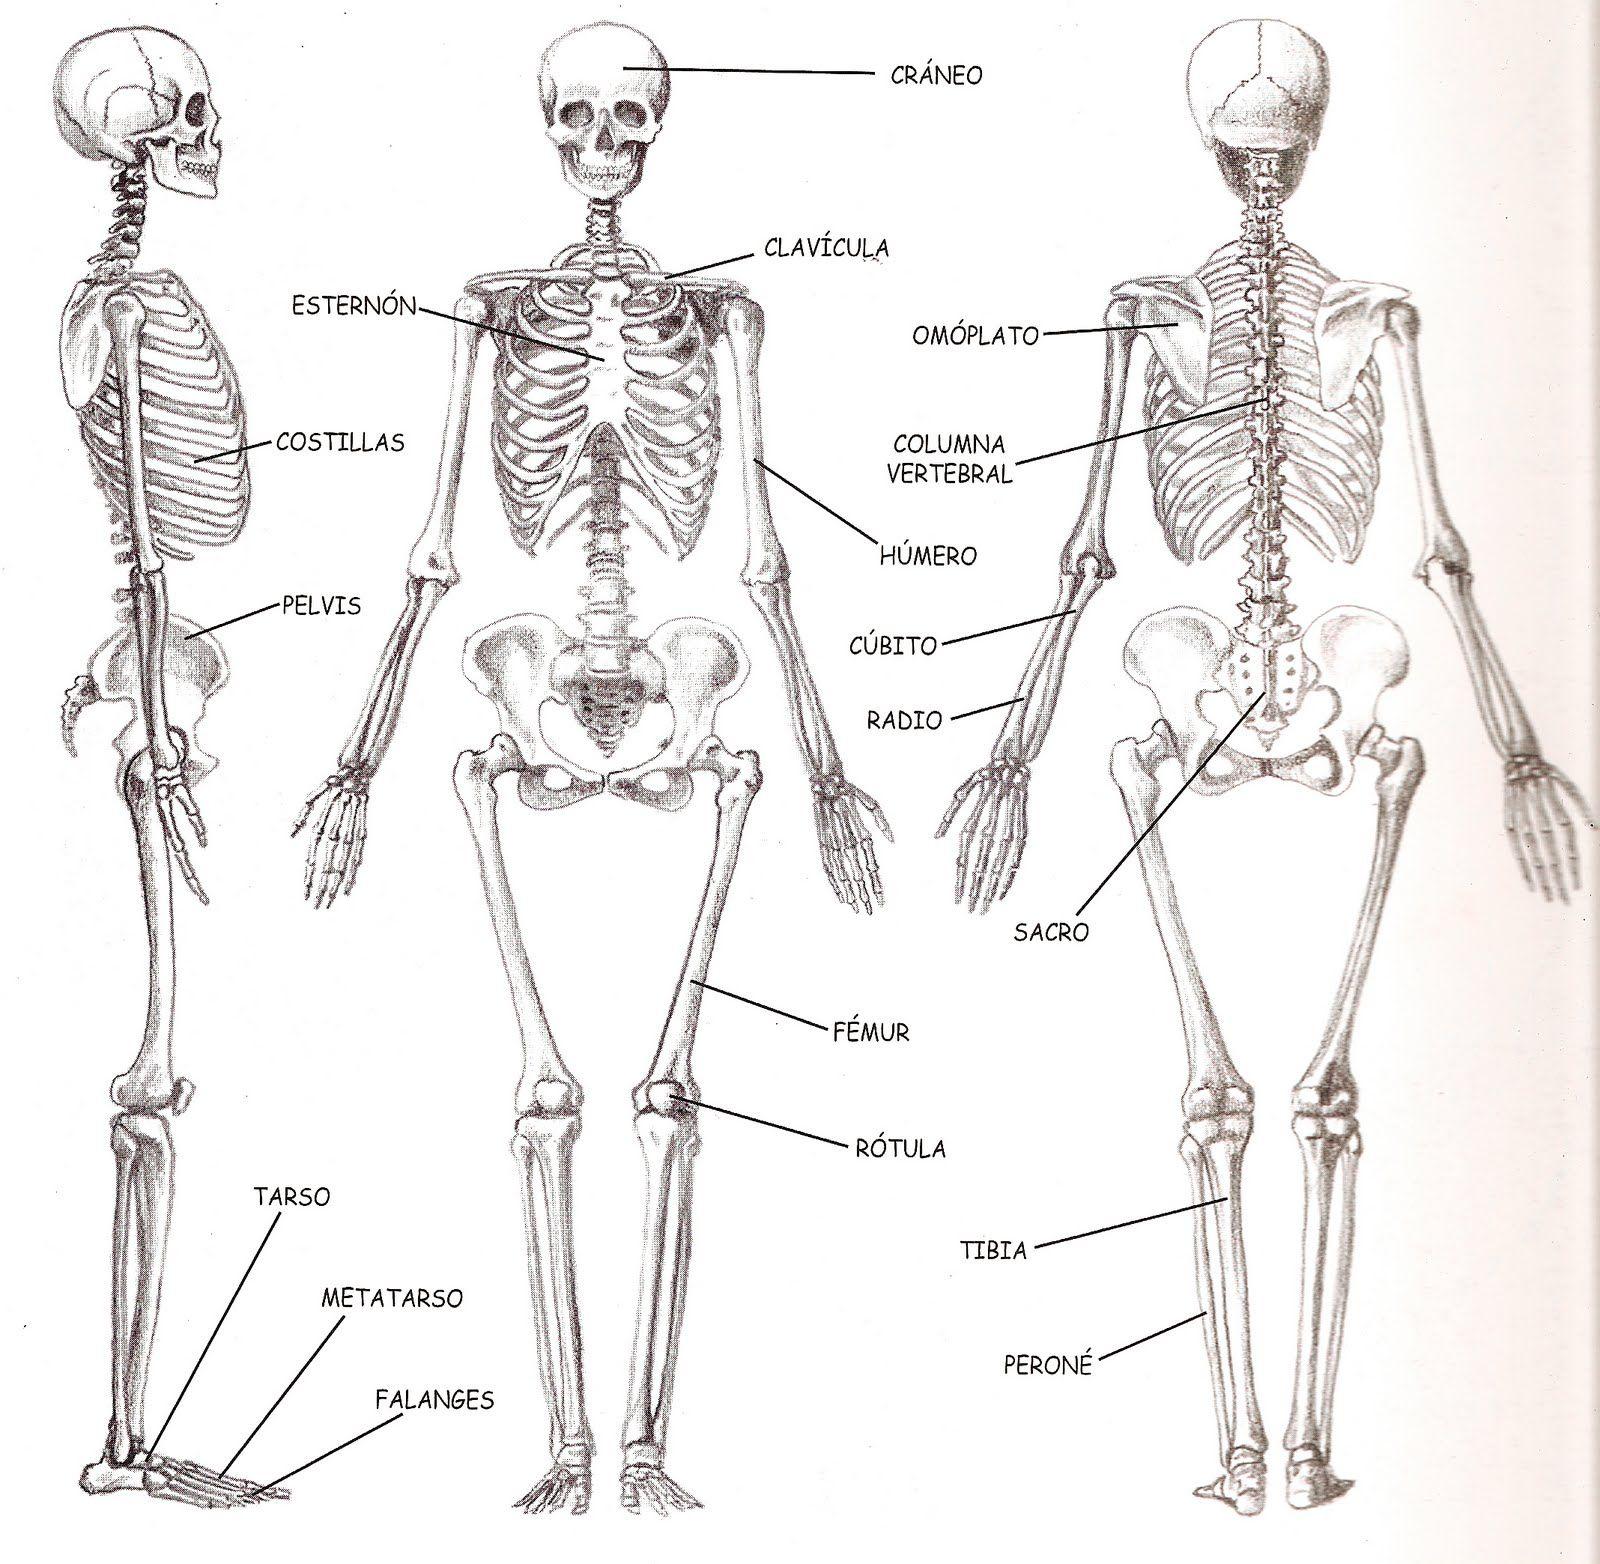 Esqueleto humano | Figurines | Pinterest | Estructura ósea humana ...